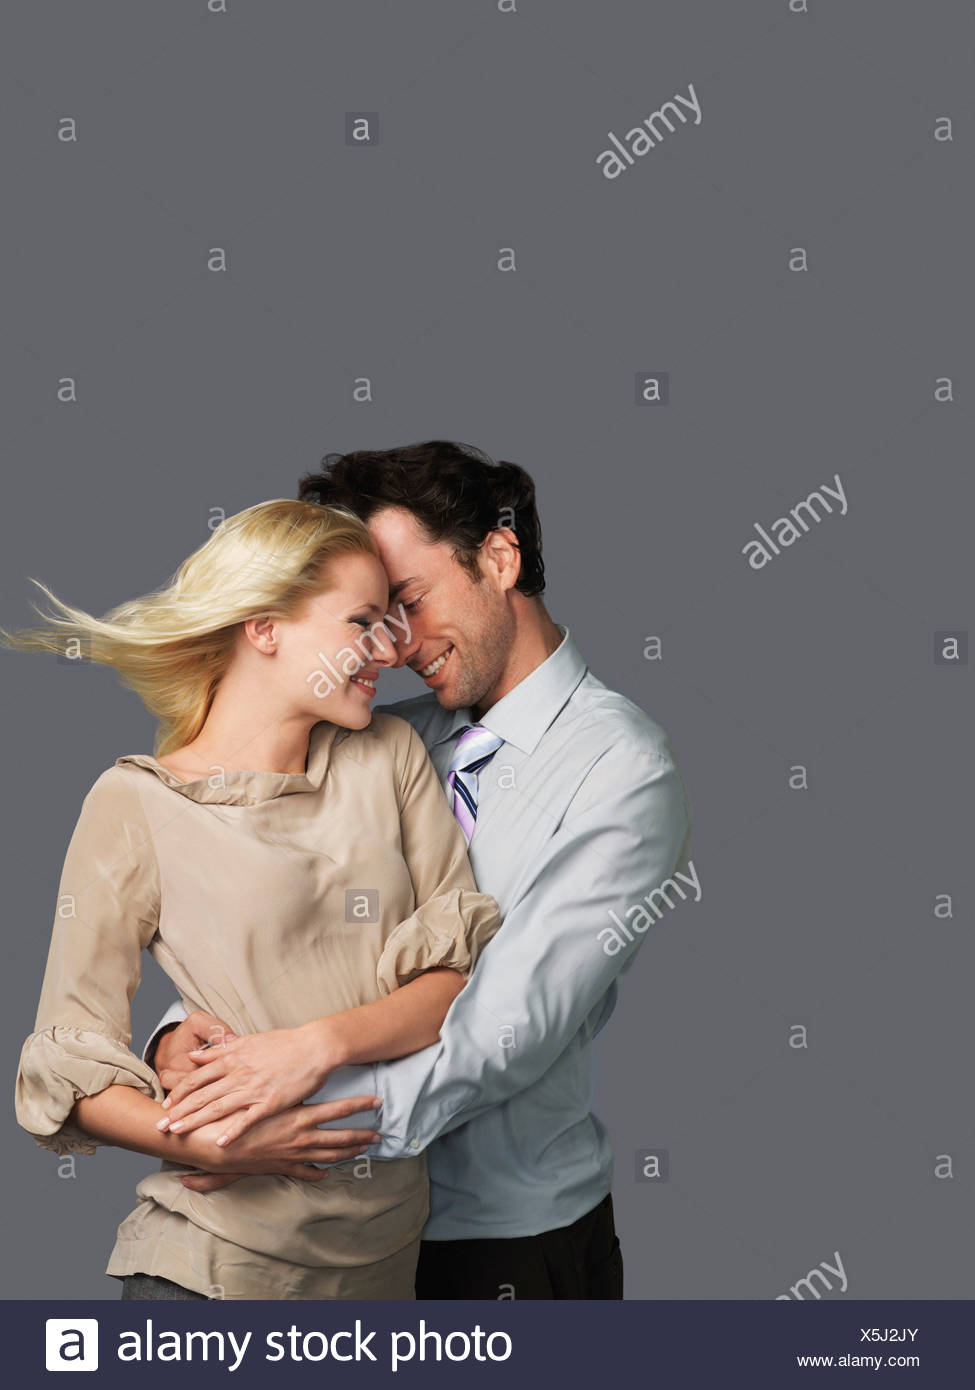 dating Breeze psyykkinen sairaus interracial dating